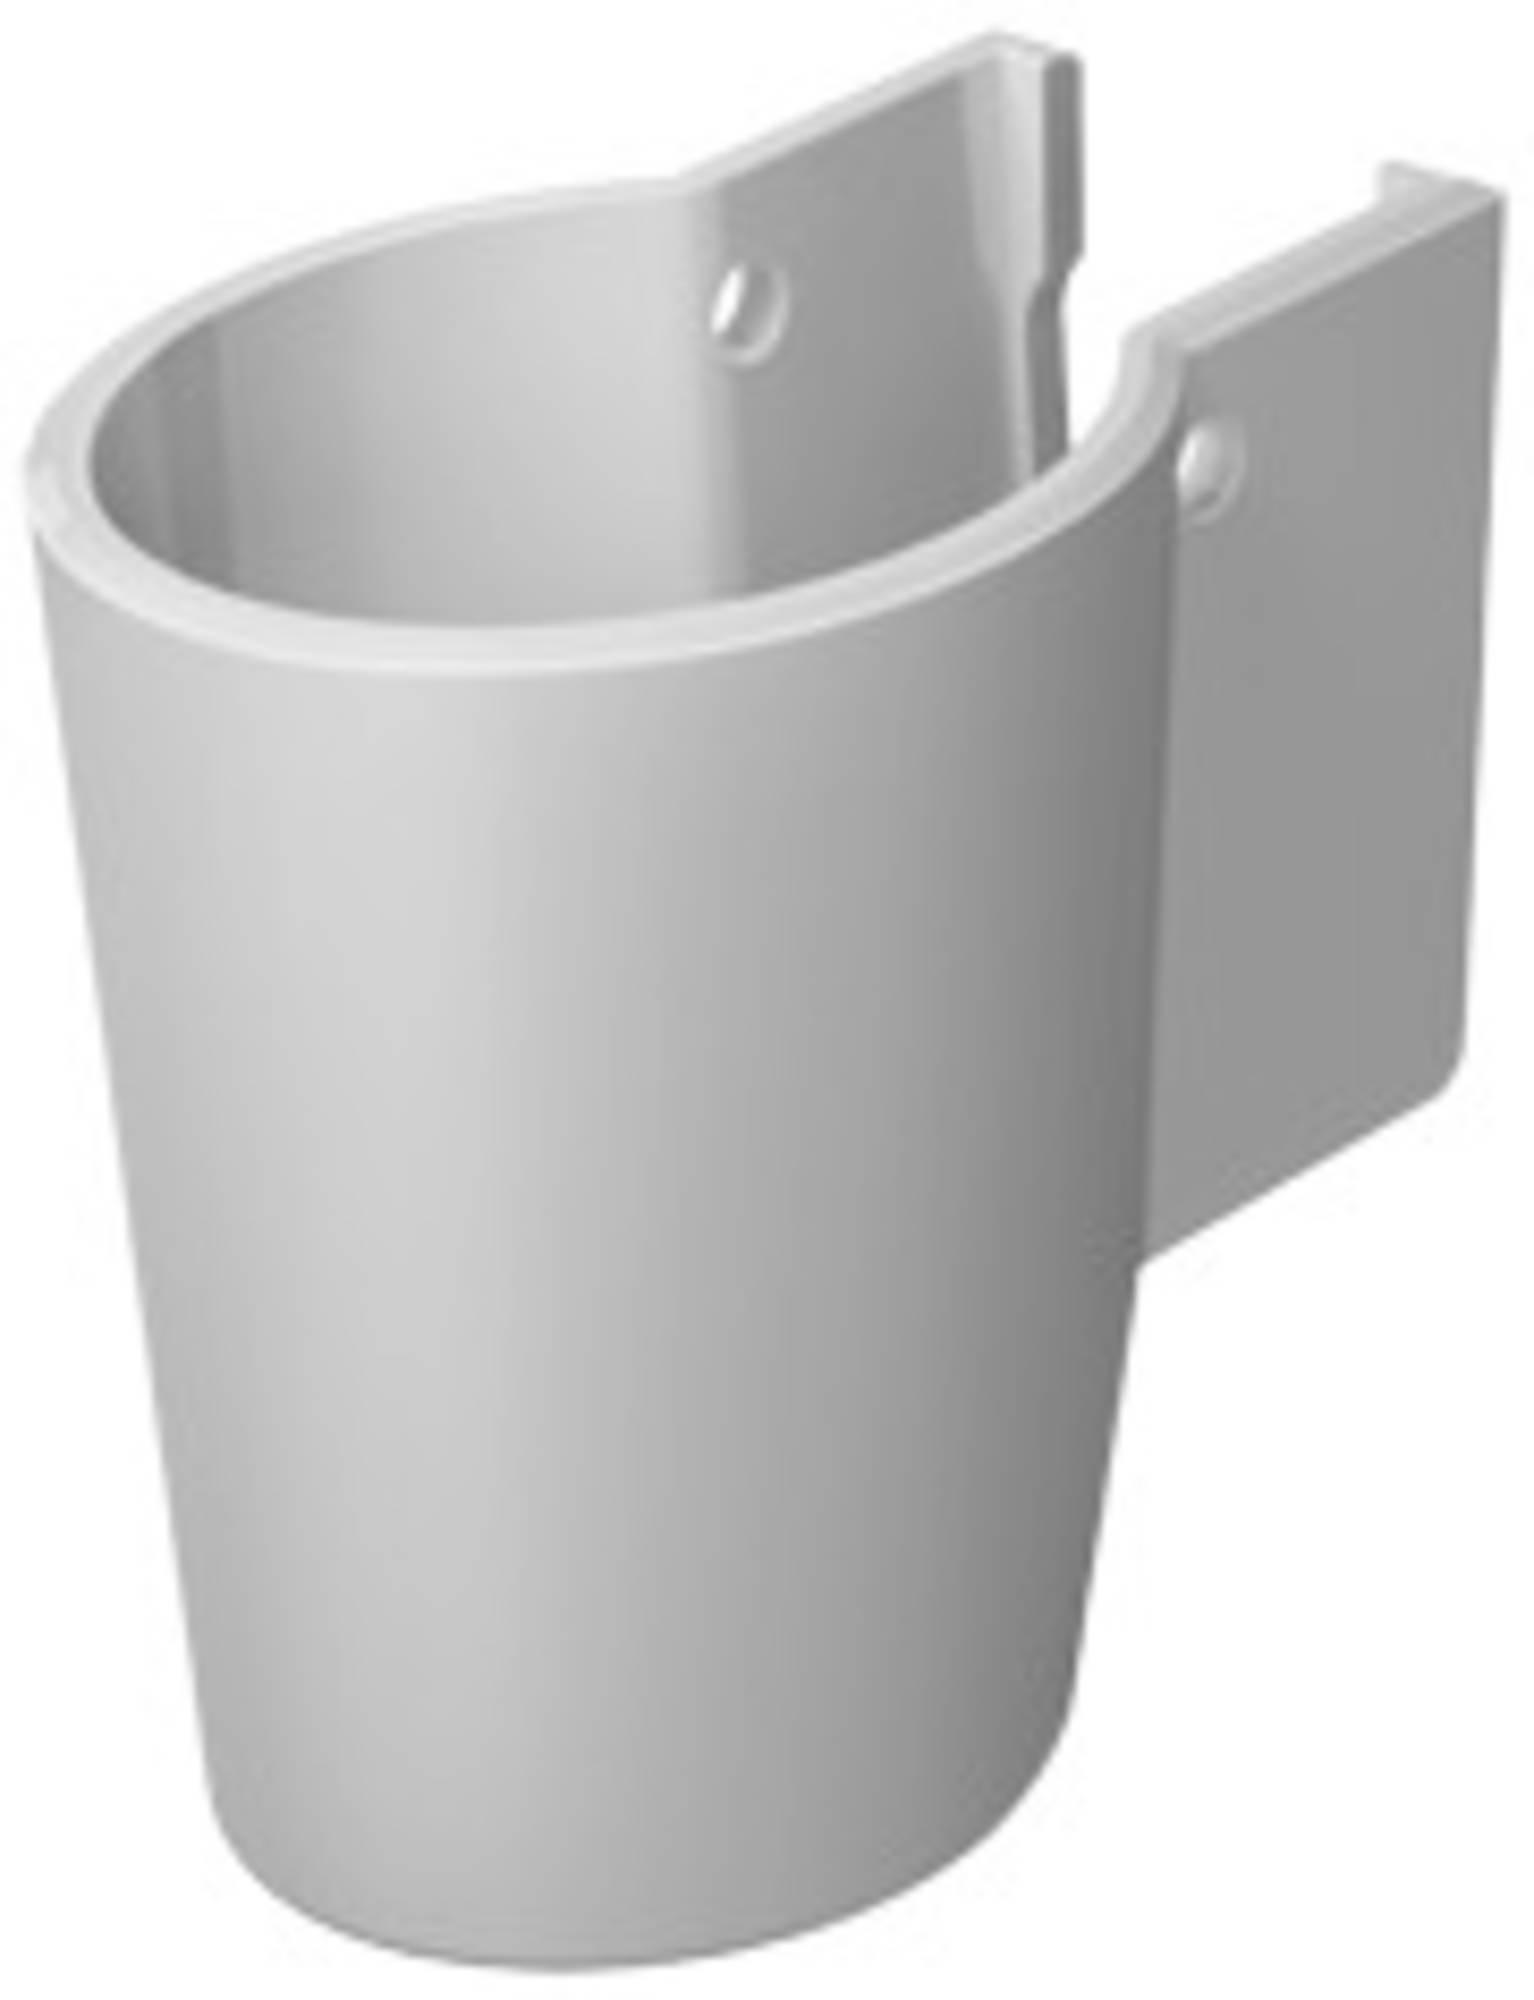 Duravit Starck 2 sifonkap voor wastafel m.WG wit